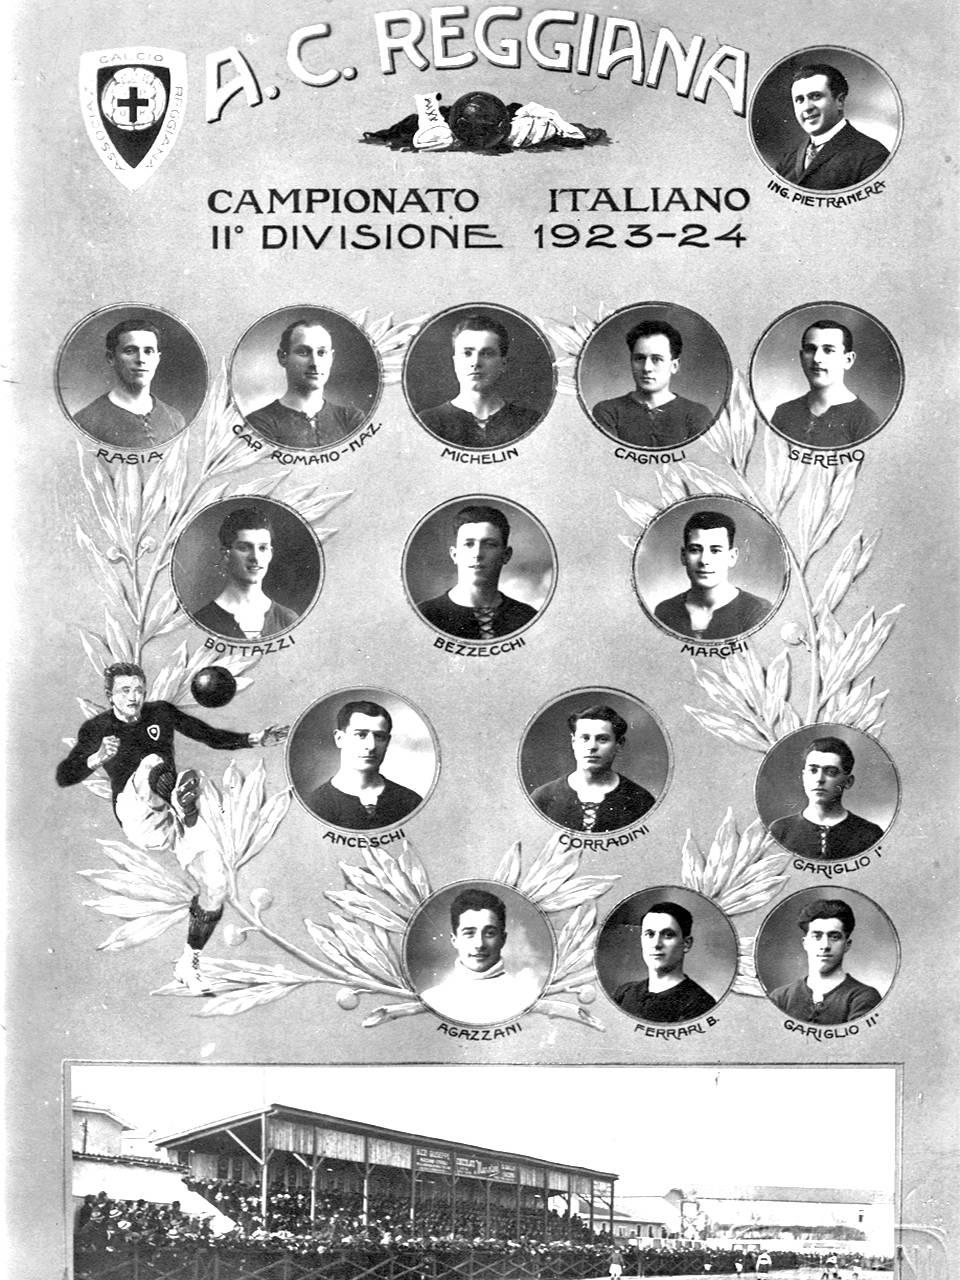 Cartolina della A.C. Reggiana 1923-1924 Fototeca Biblioteca Panizzi, Fondo Renzo Vaiani, Reggio Emilia 1924